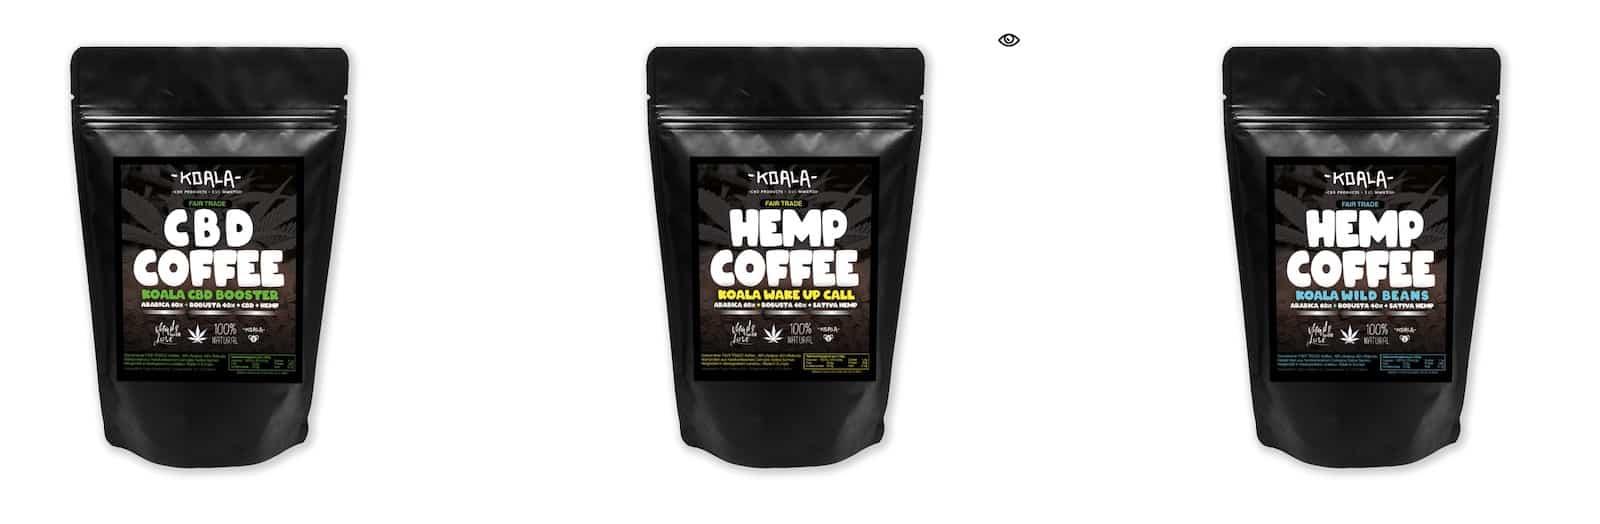 Koala CBD-Kaffee